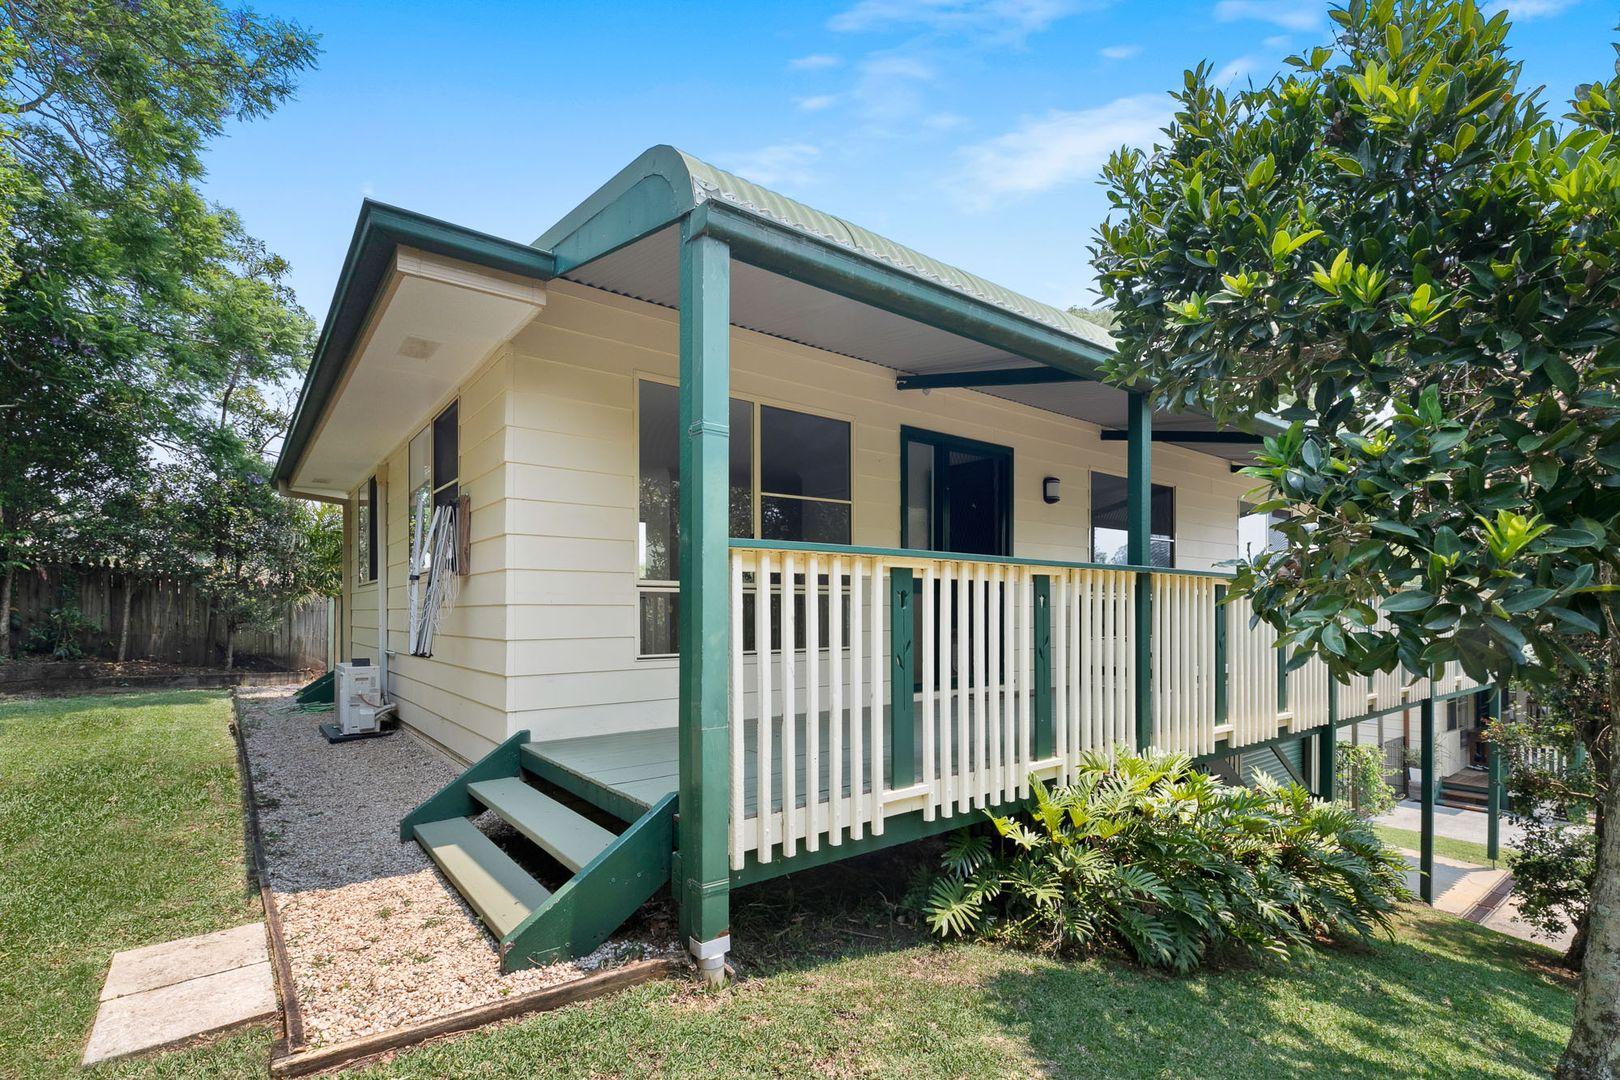 2/9 Colin Street, Bangalow NSW 2479, Image 0